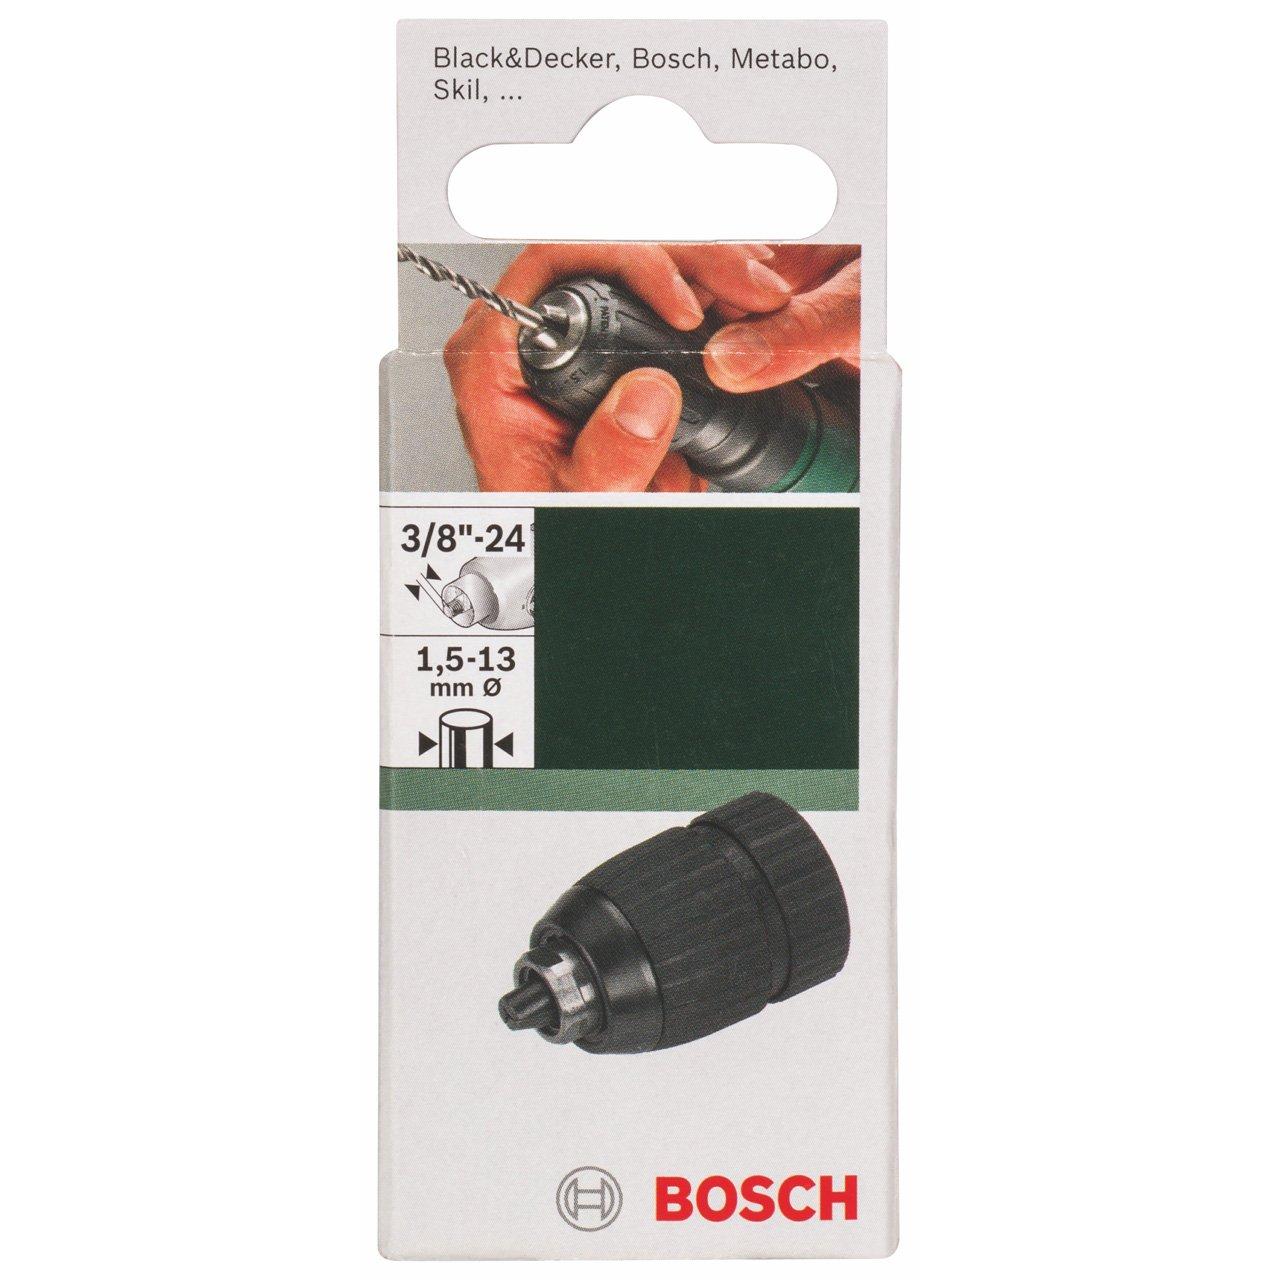 Bosch 2609255707 1.5-13mm 3//8-inch x 24-Thread Keyless Chuck